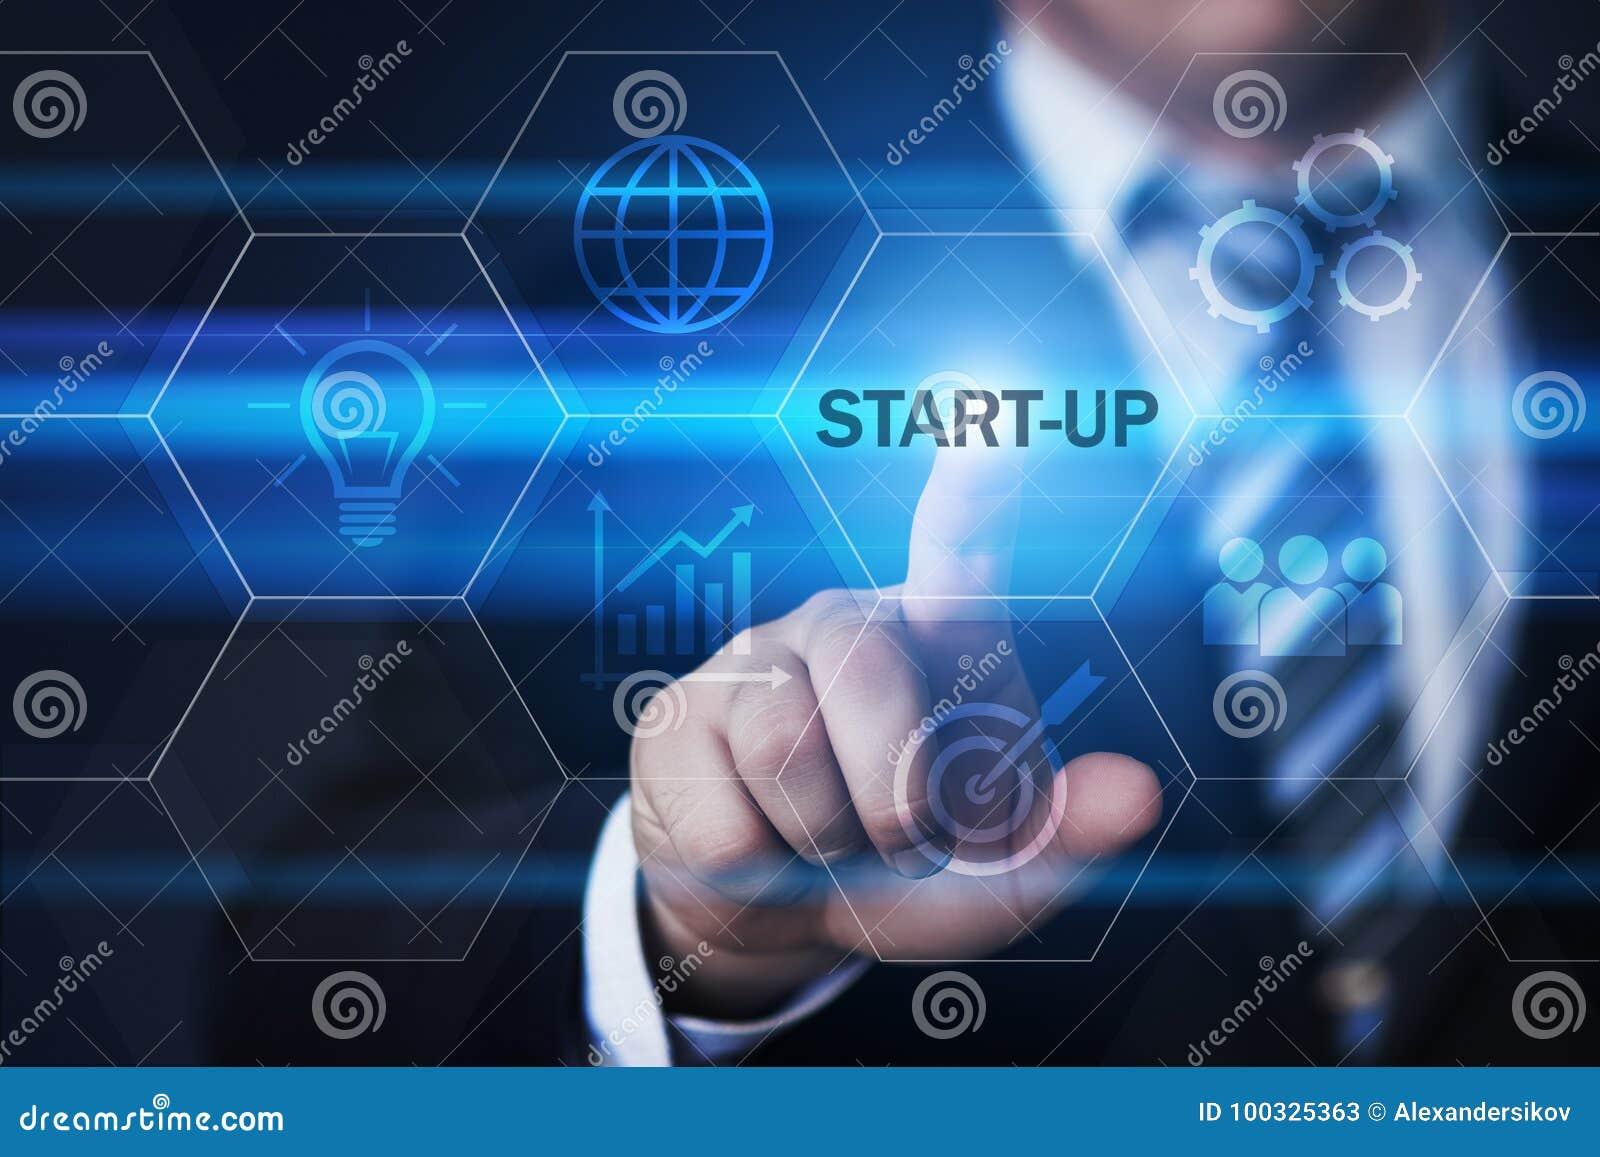 Entrepreneurship Stock Photos - Royalty Free Images